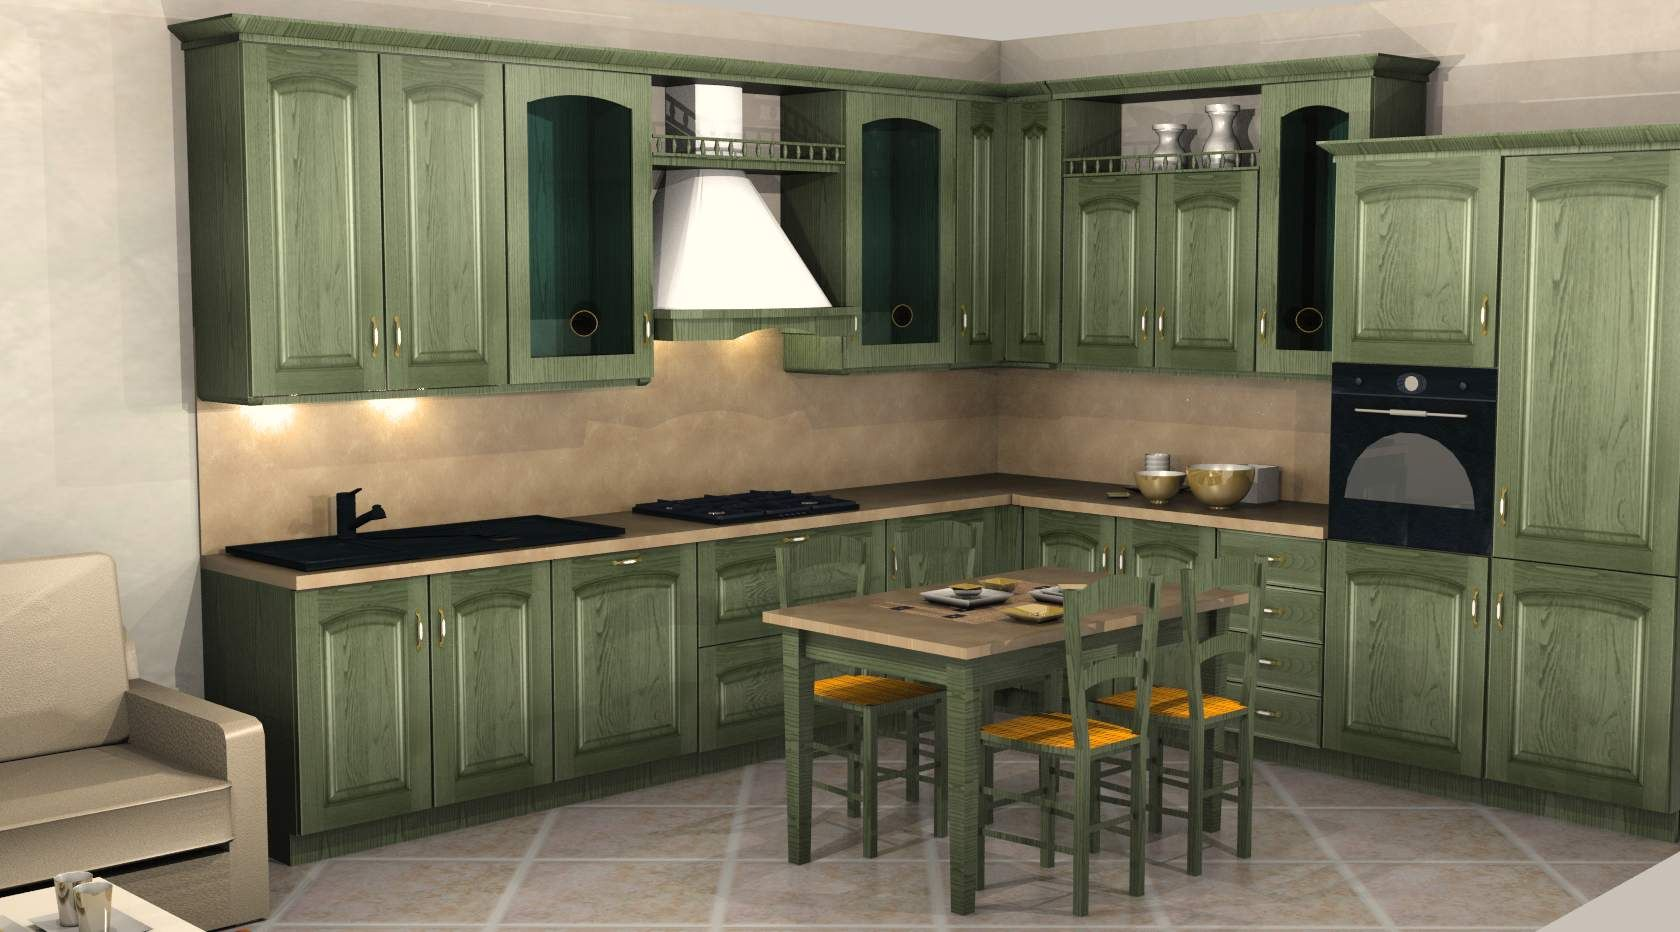 Cucina by #Scavolini #kitchen #kitchens @Sermobil #design